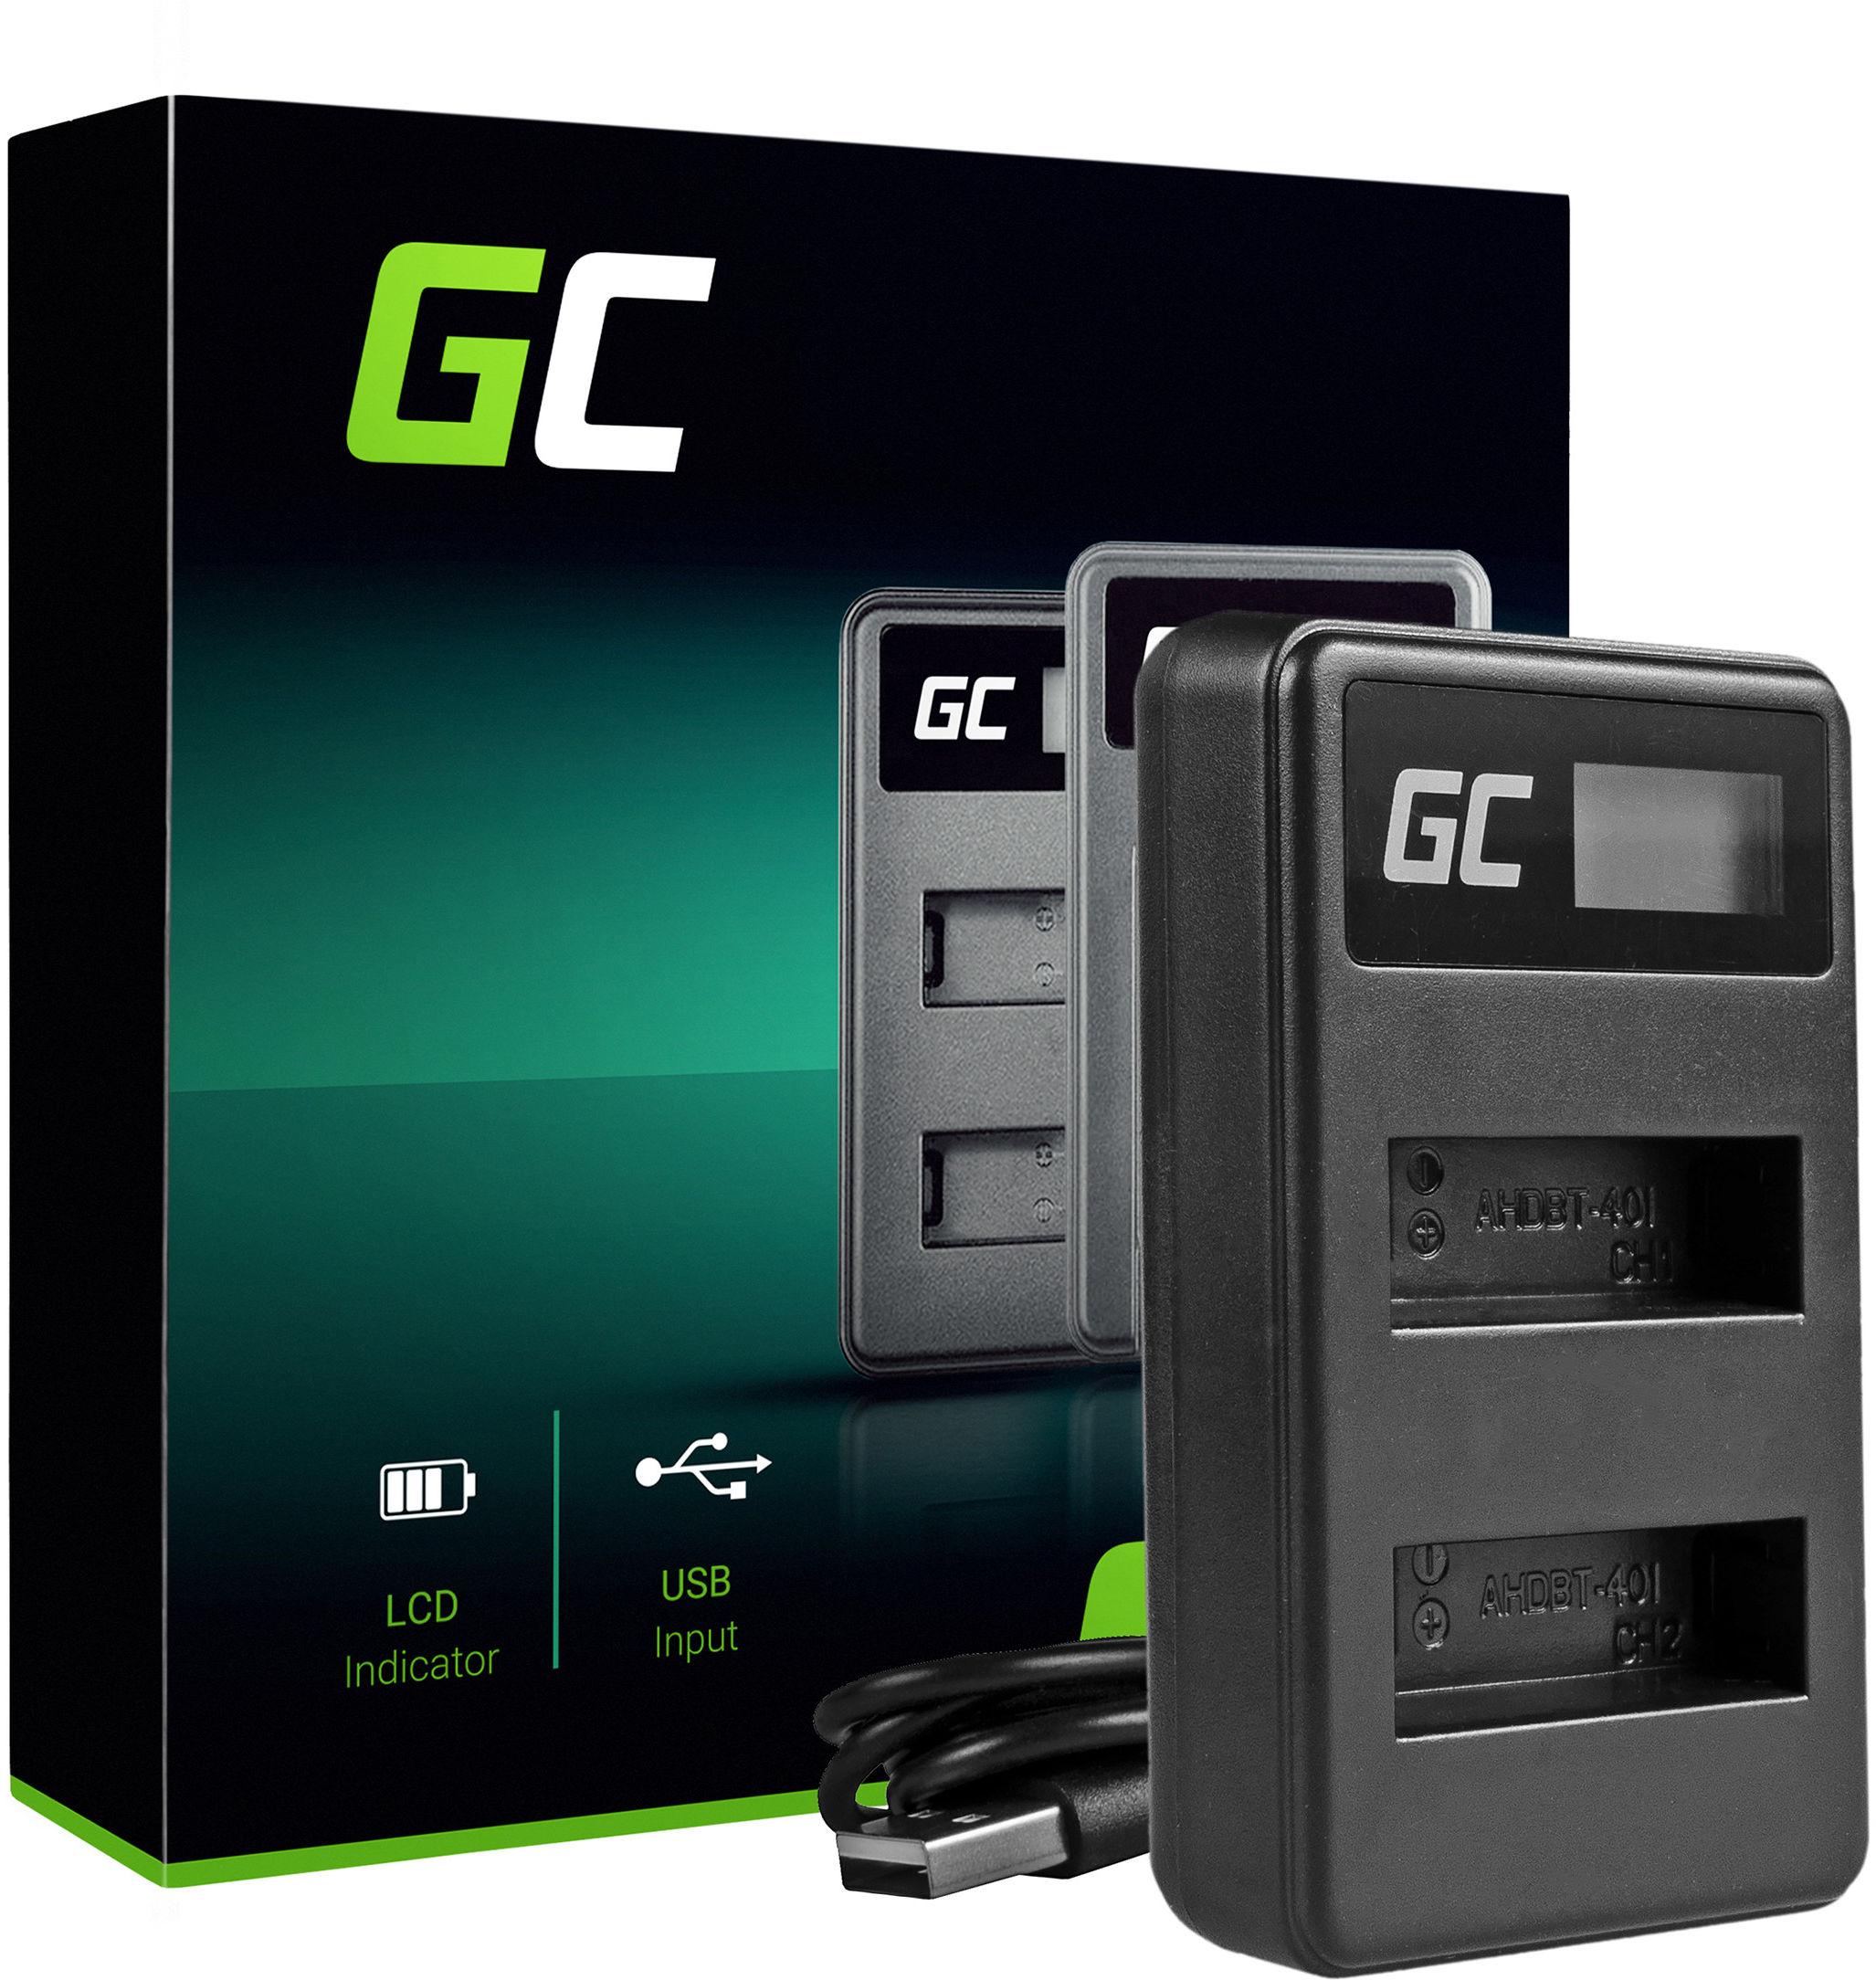 Ładowarka AHBBP-401 Green Cell  do GoPro HERO 4 CHDBX CHDBY CHDHX CHDHY Black White Silver Edition (4.2v 2.5w 0.6A)